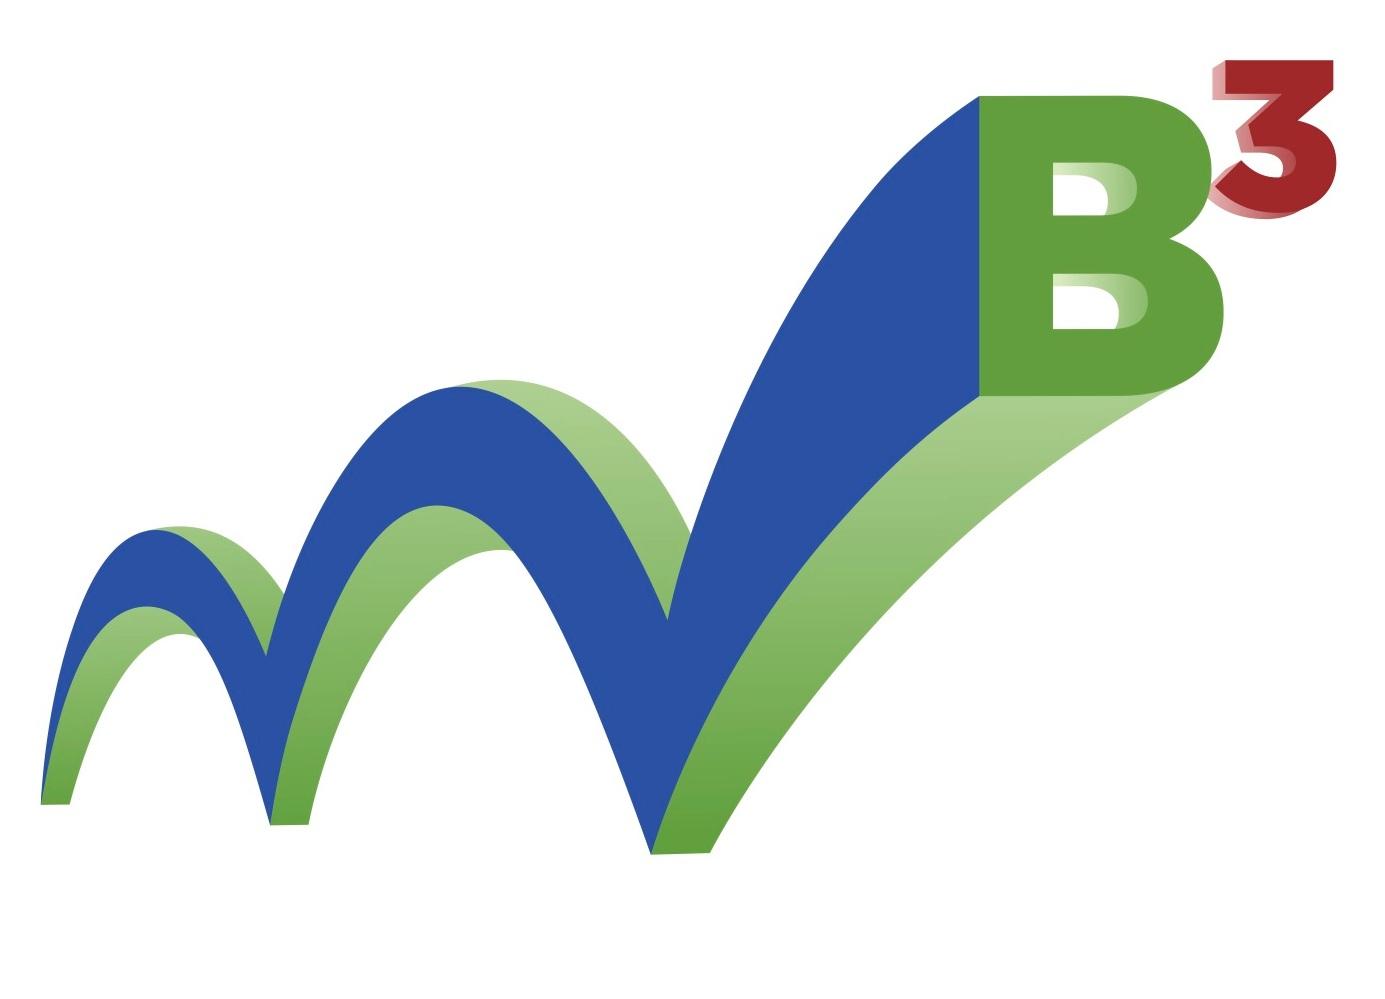 B3+Tricolor+Logo.jpg